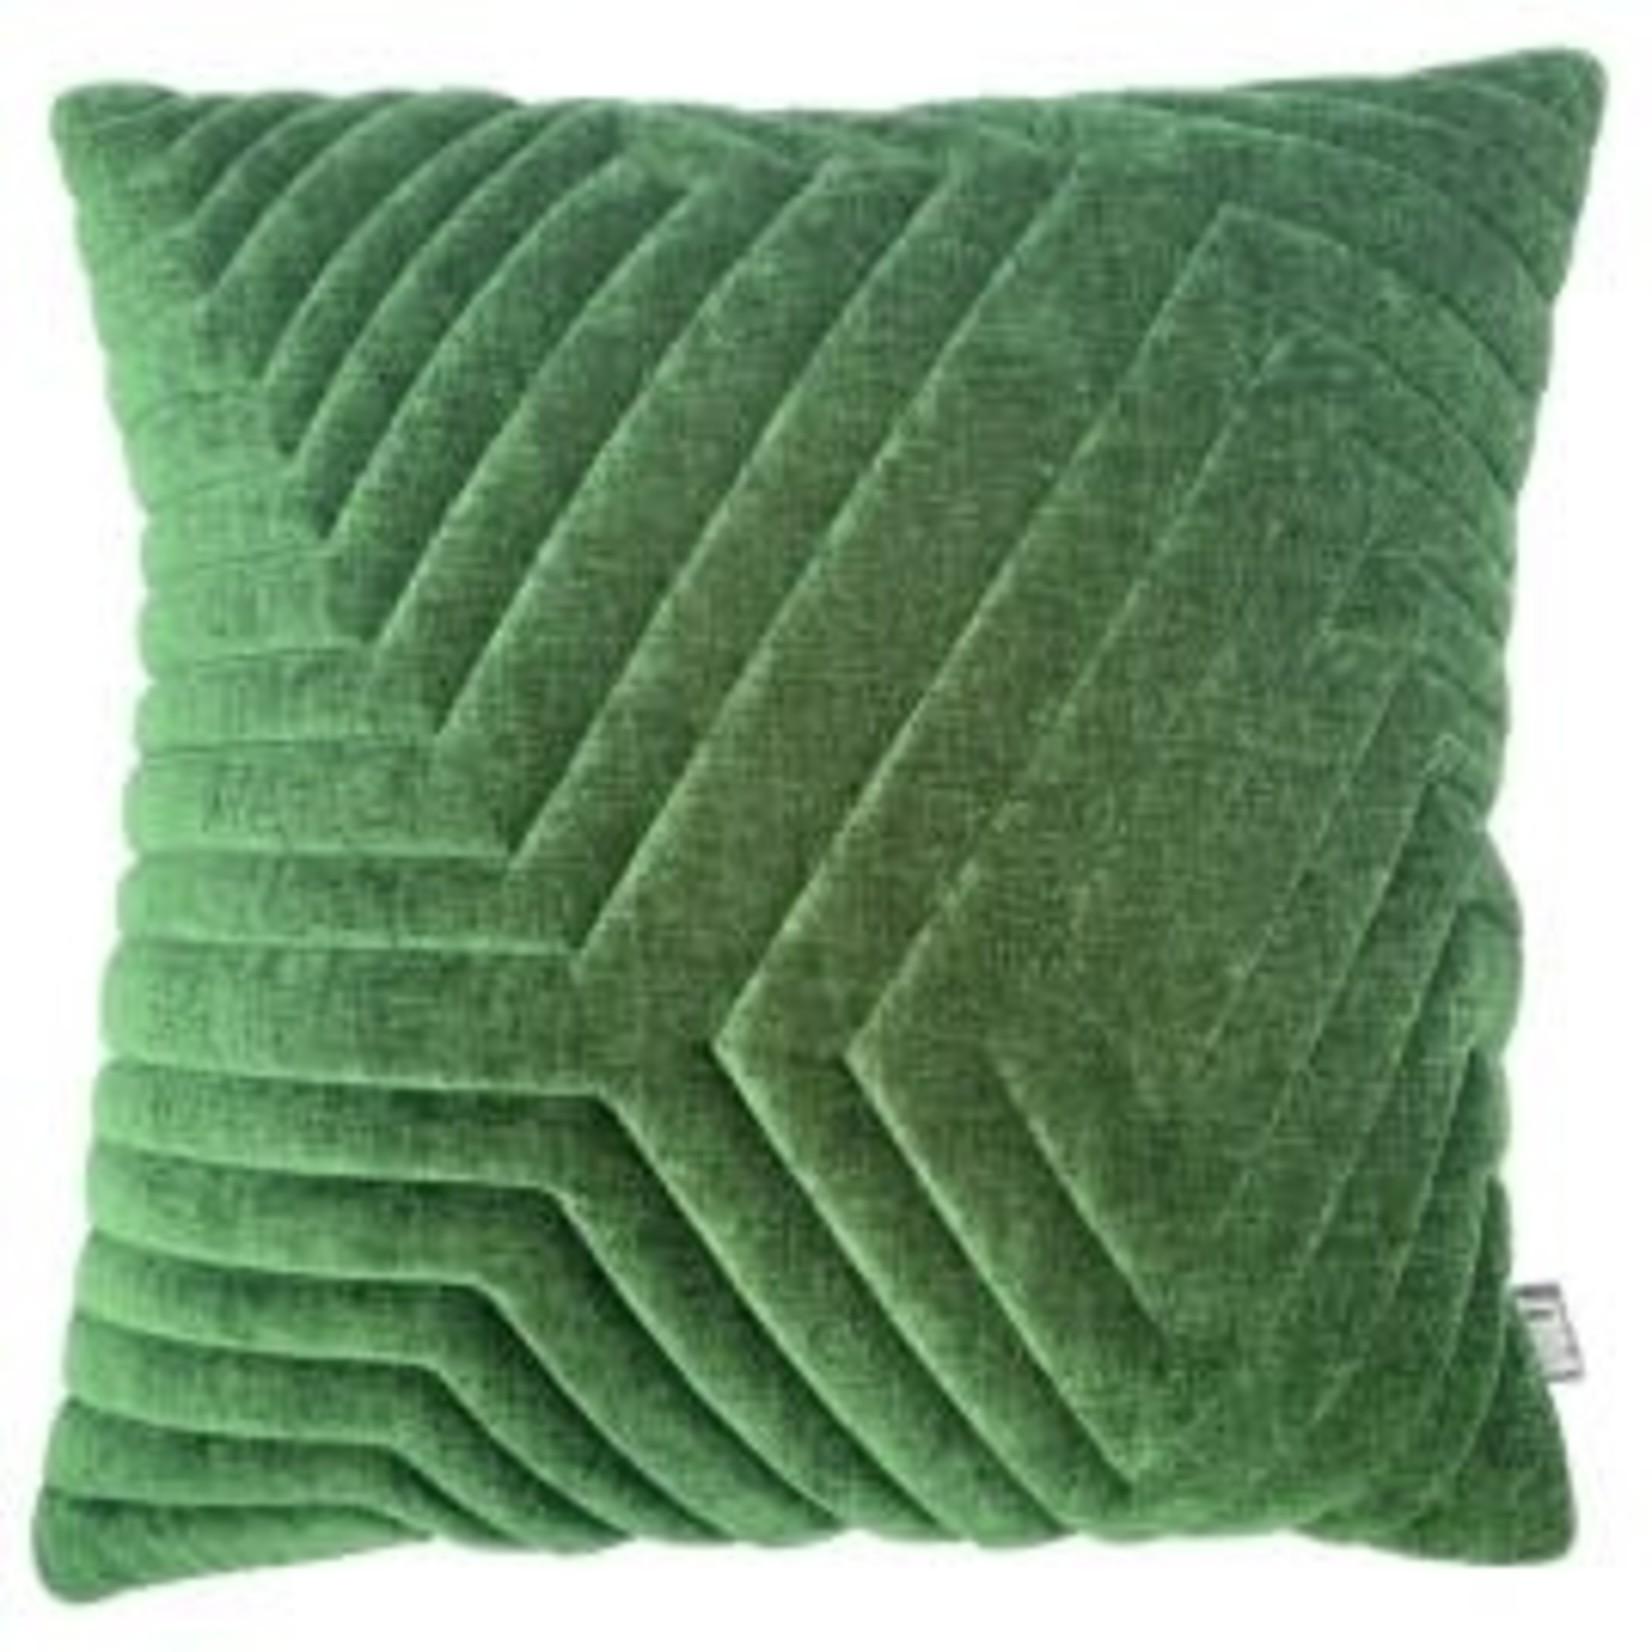 Volt Volt cushion 3D Maze 60x60cm Velvet pista green